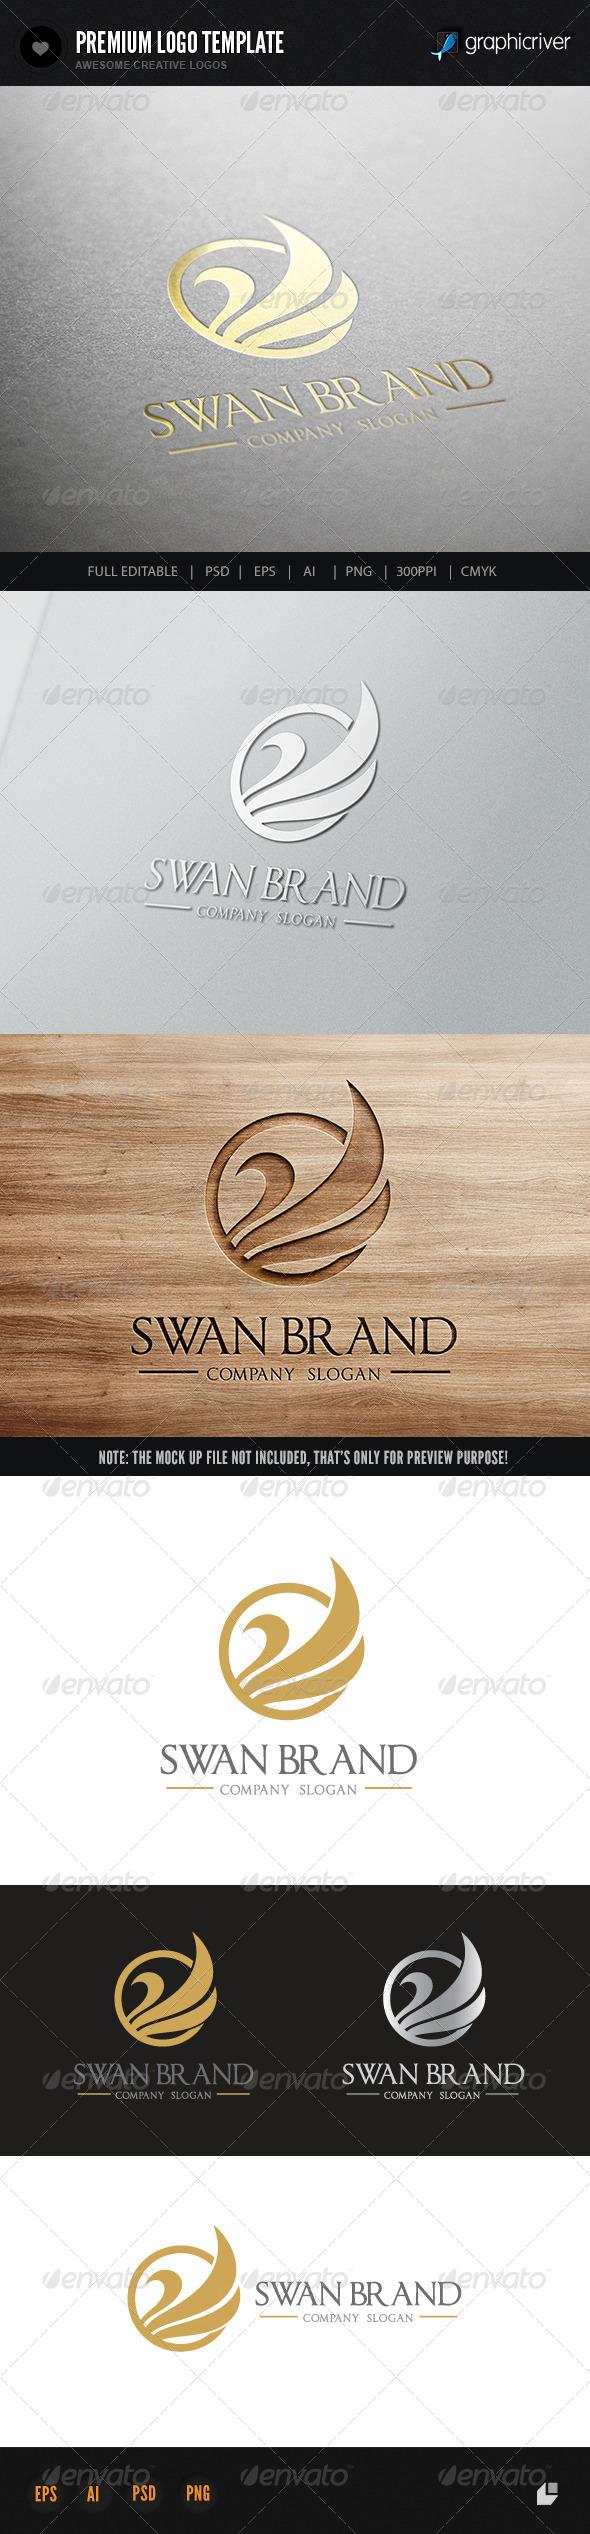 swan-brand